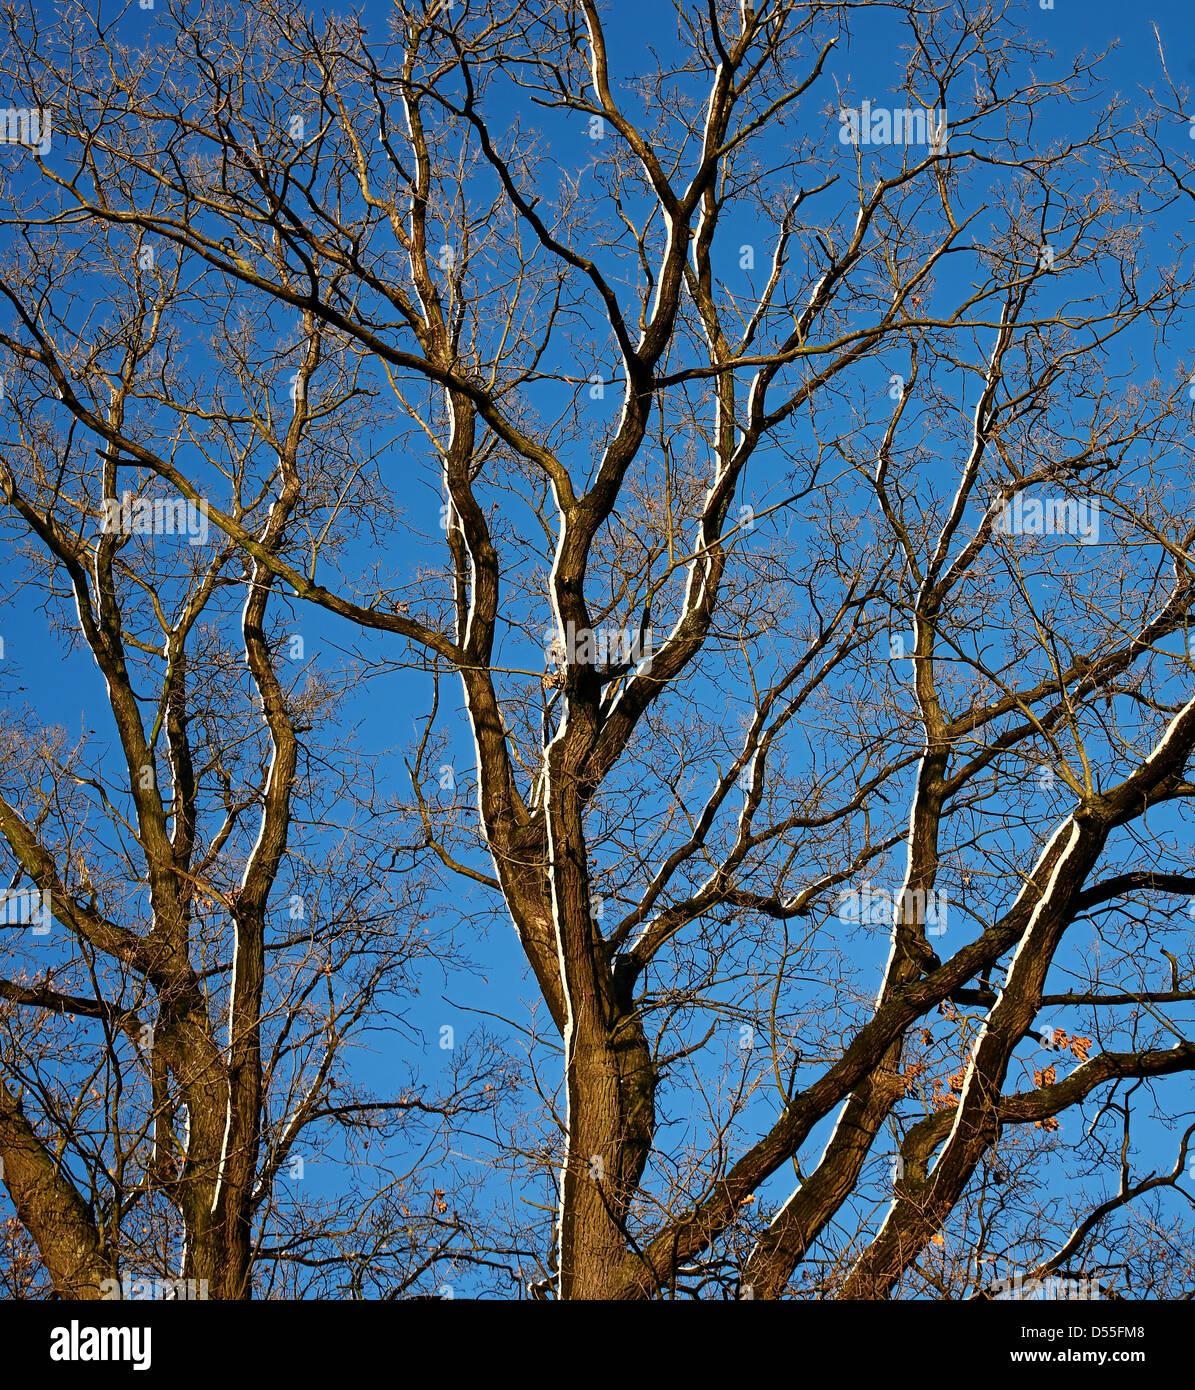 Ochtmannnsbruch, Germany, leafless tree in winter - Stock Image